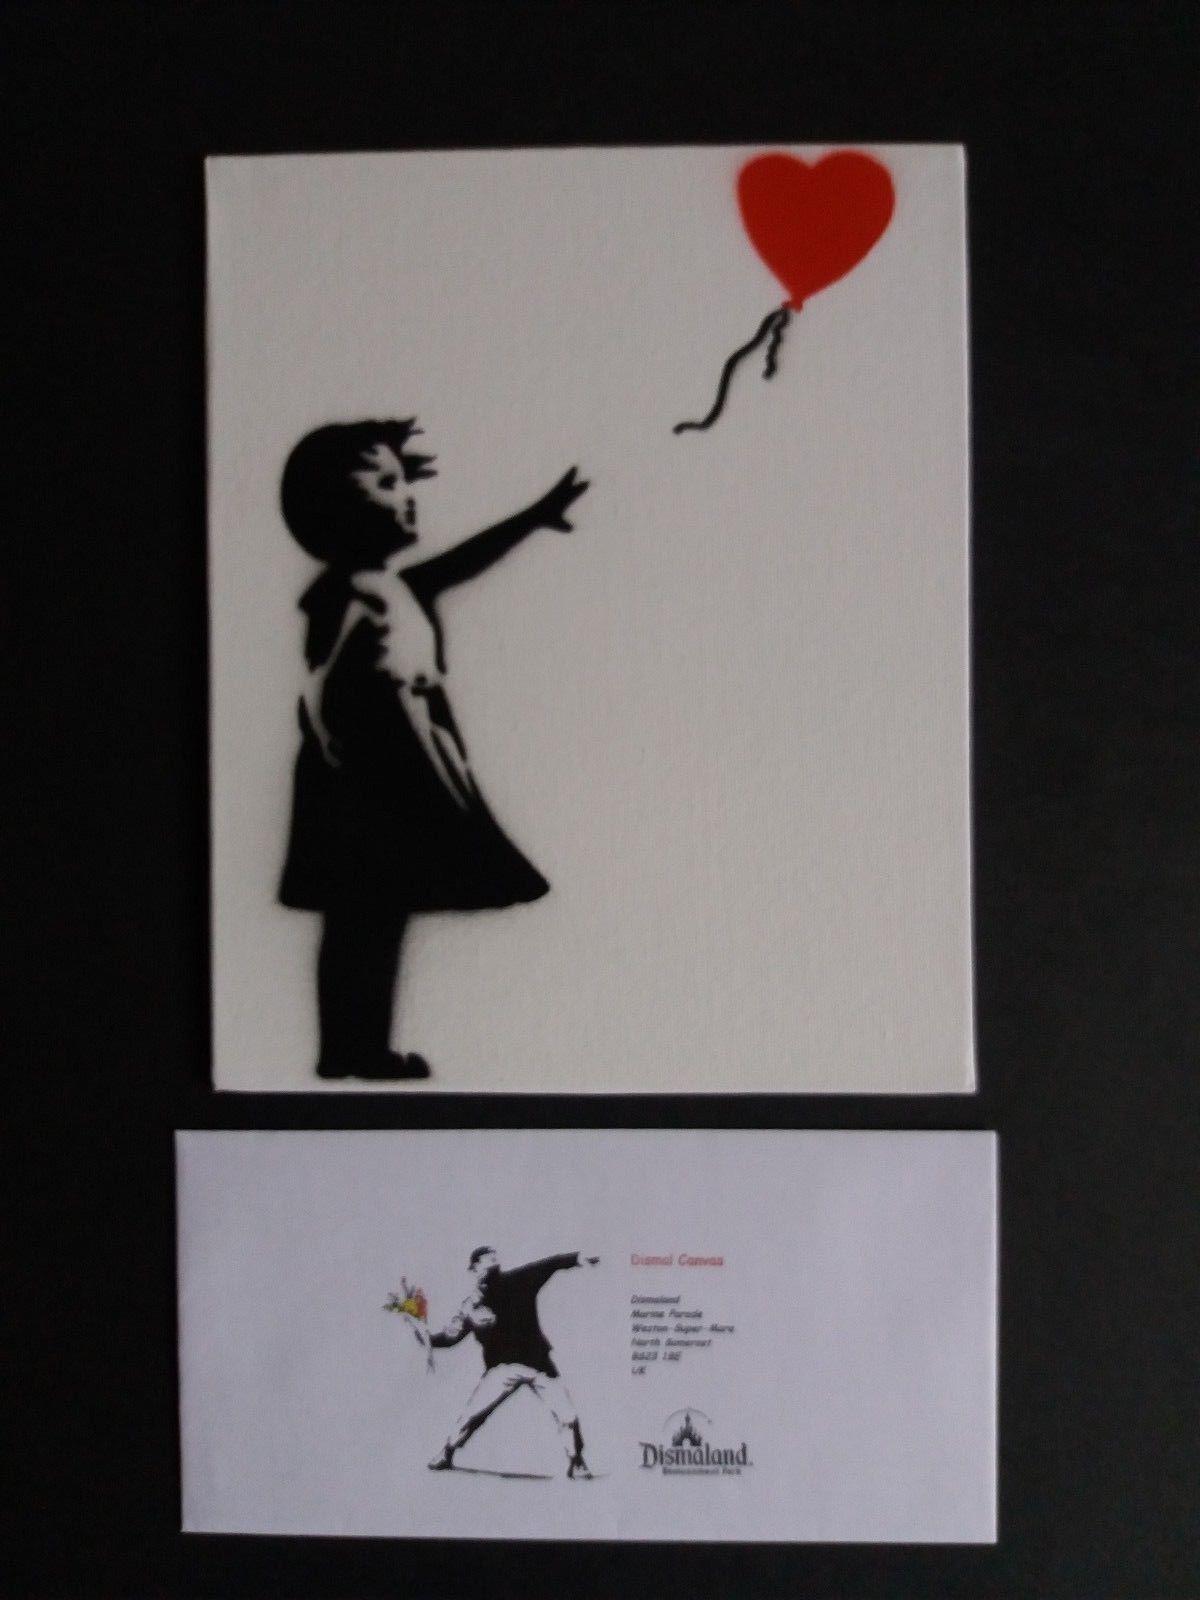 Banksy balloon girl | Banksy fridge magnet | Banksy canvas art | banksy print Banksy refrigerator magnets 6 designs available.